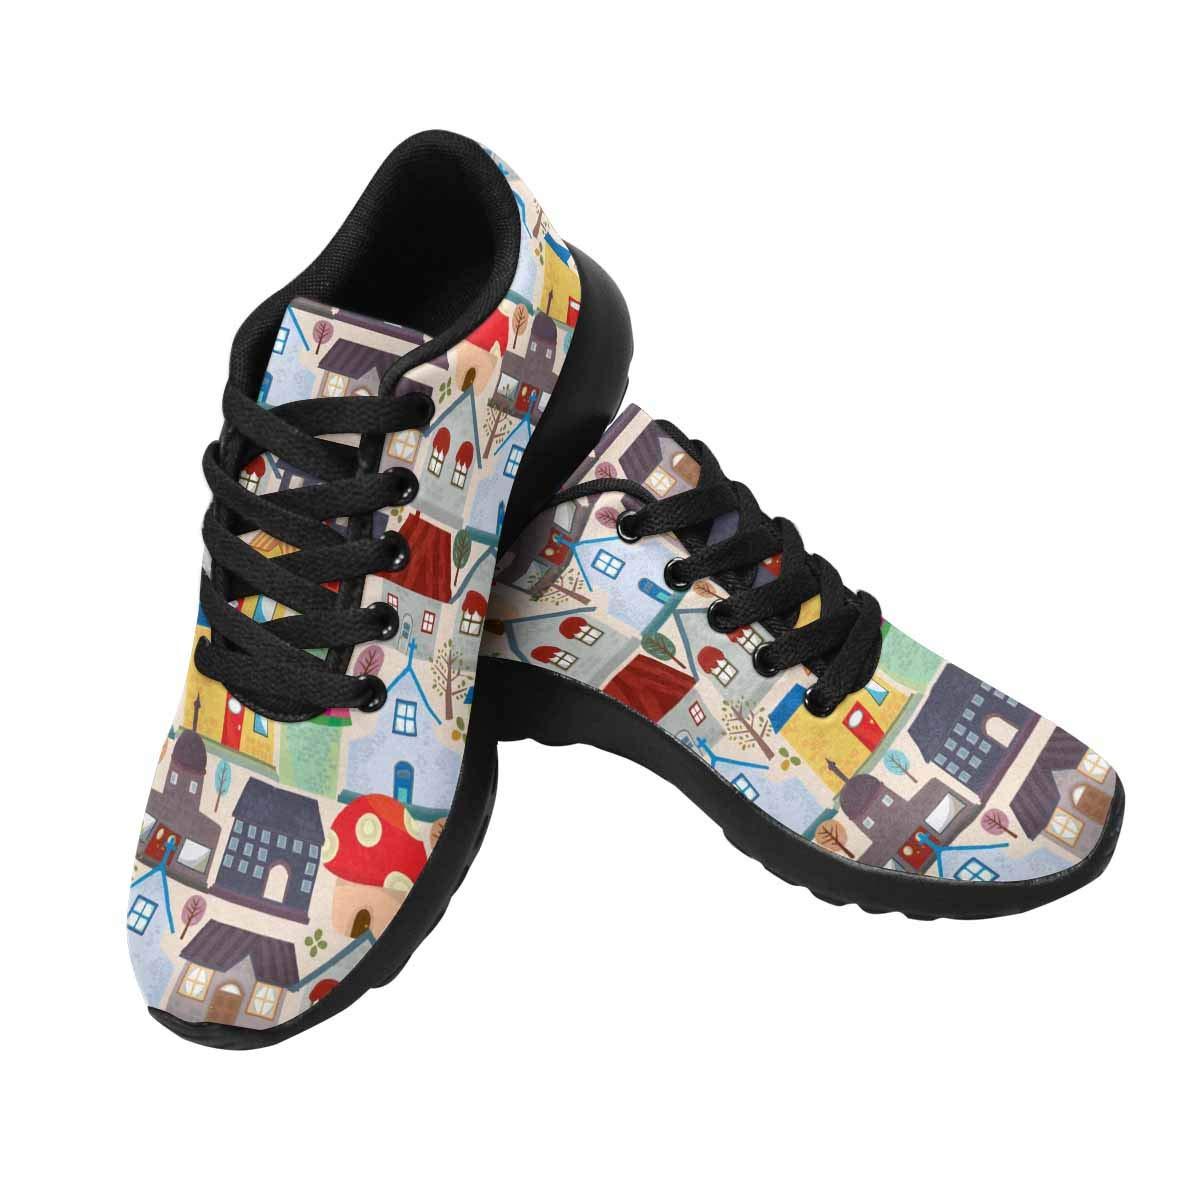 InterestPrint Women's Jogging Sneaker Casual Walking Comfort Running Shoes US12 City Pattern